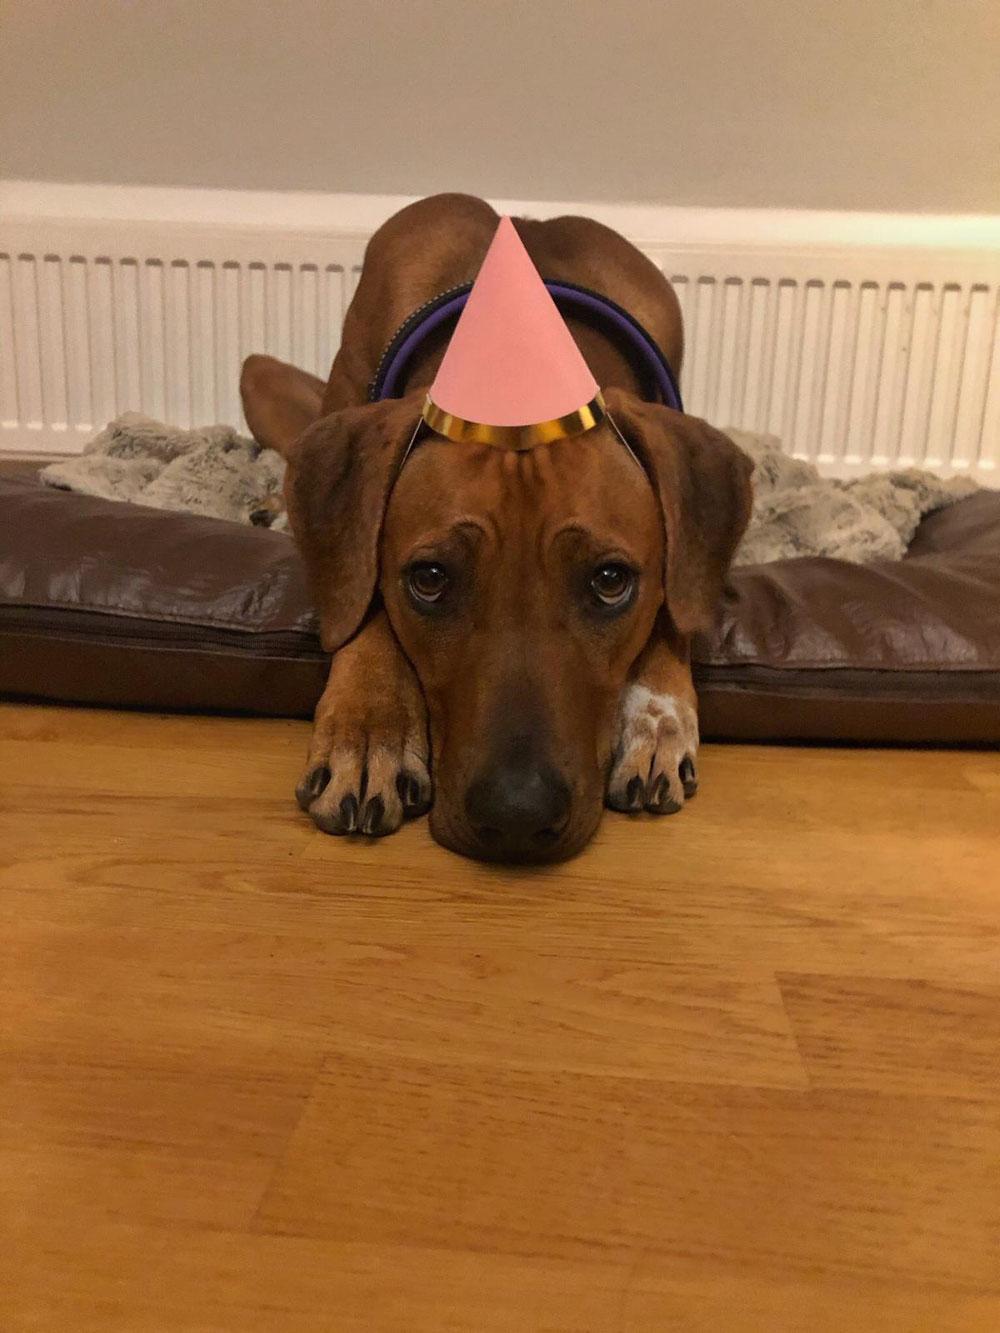 2. Geburtstag ❤️